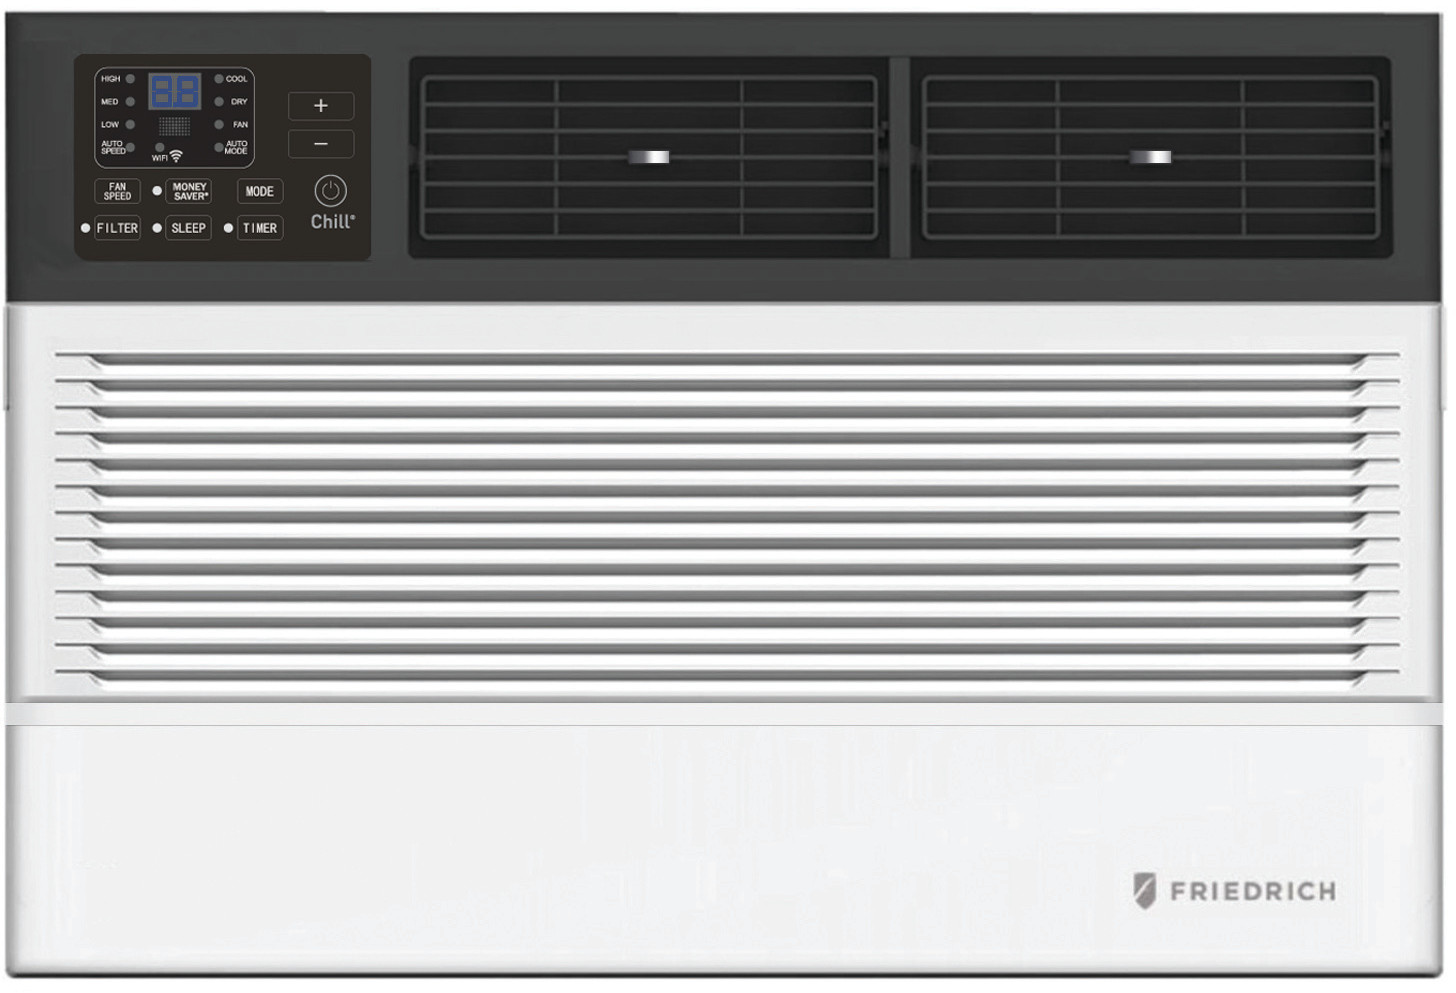 Friedrich Chill Premier 6,000 BTU Window Air Conditioner CCF06A10A